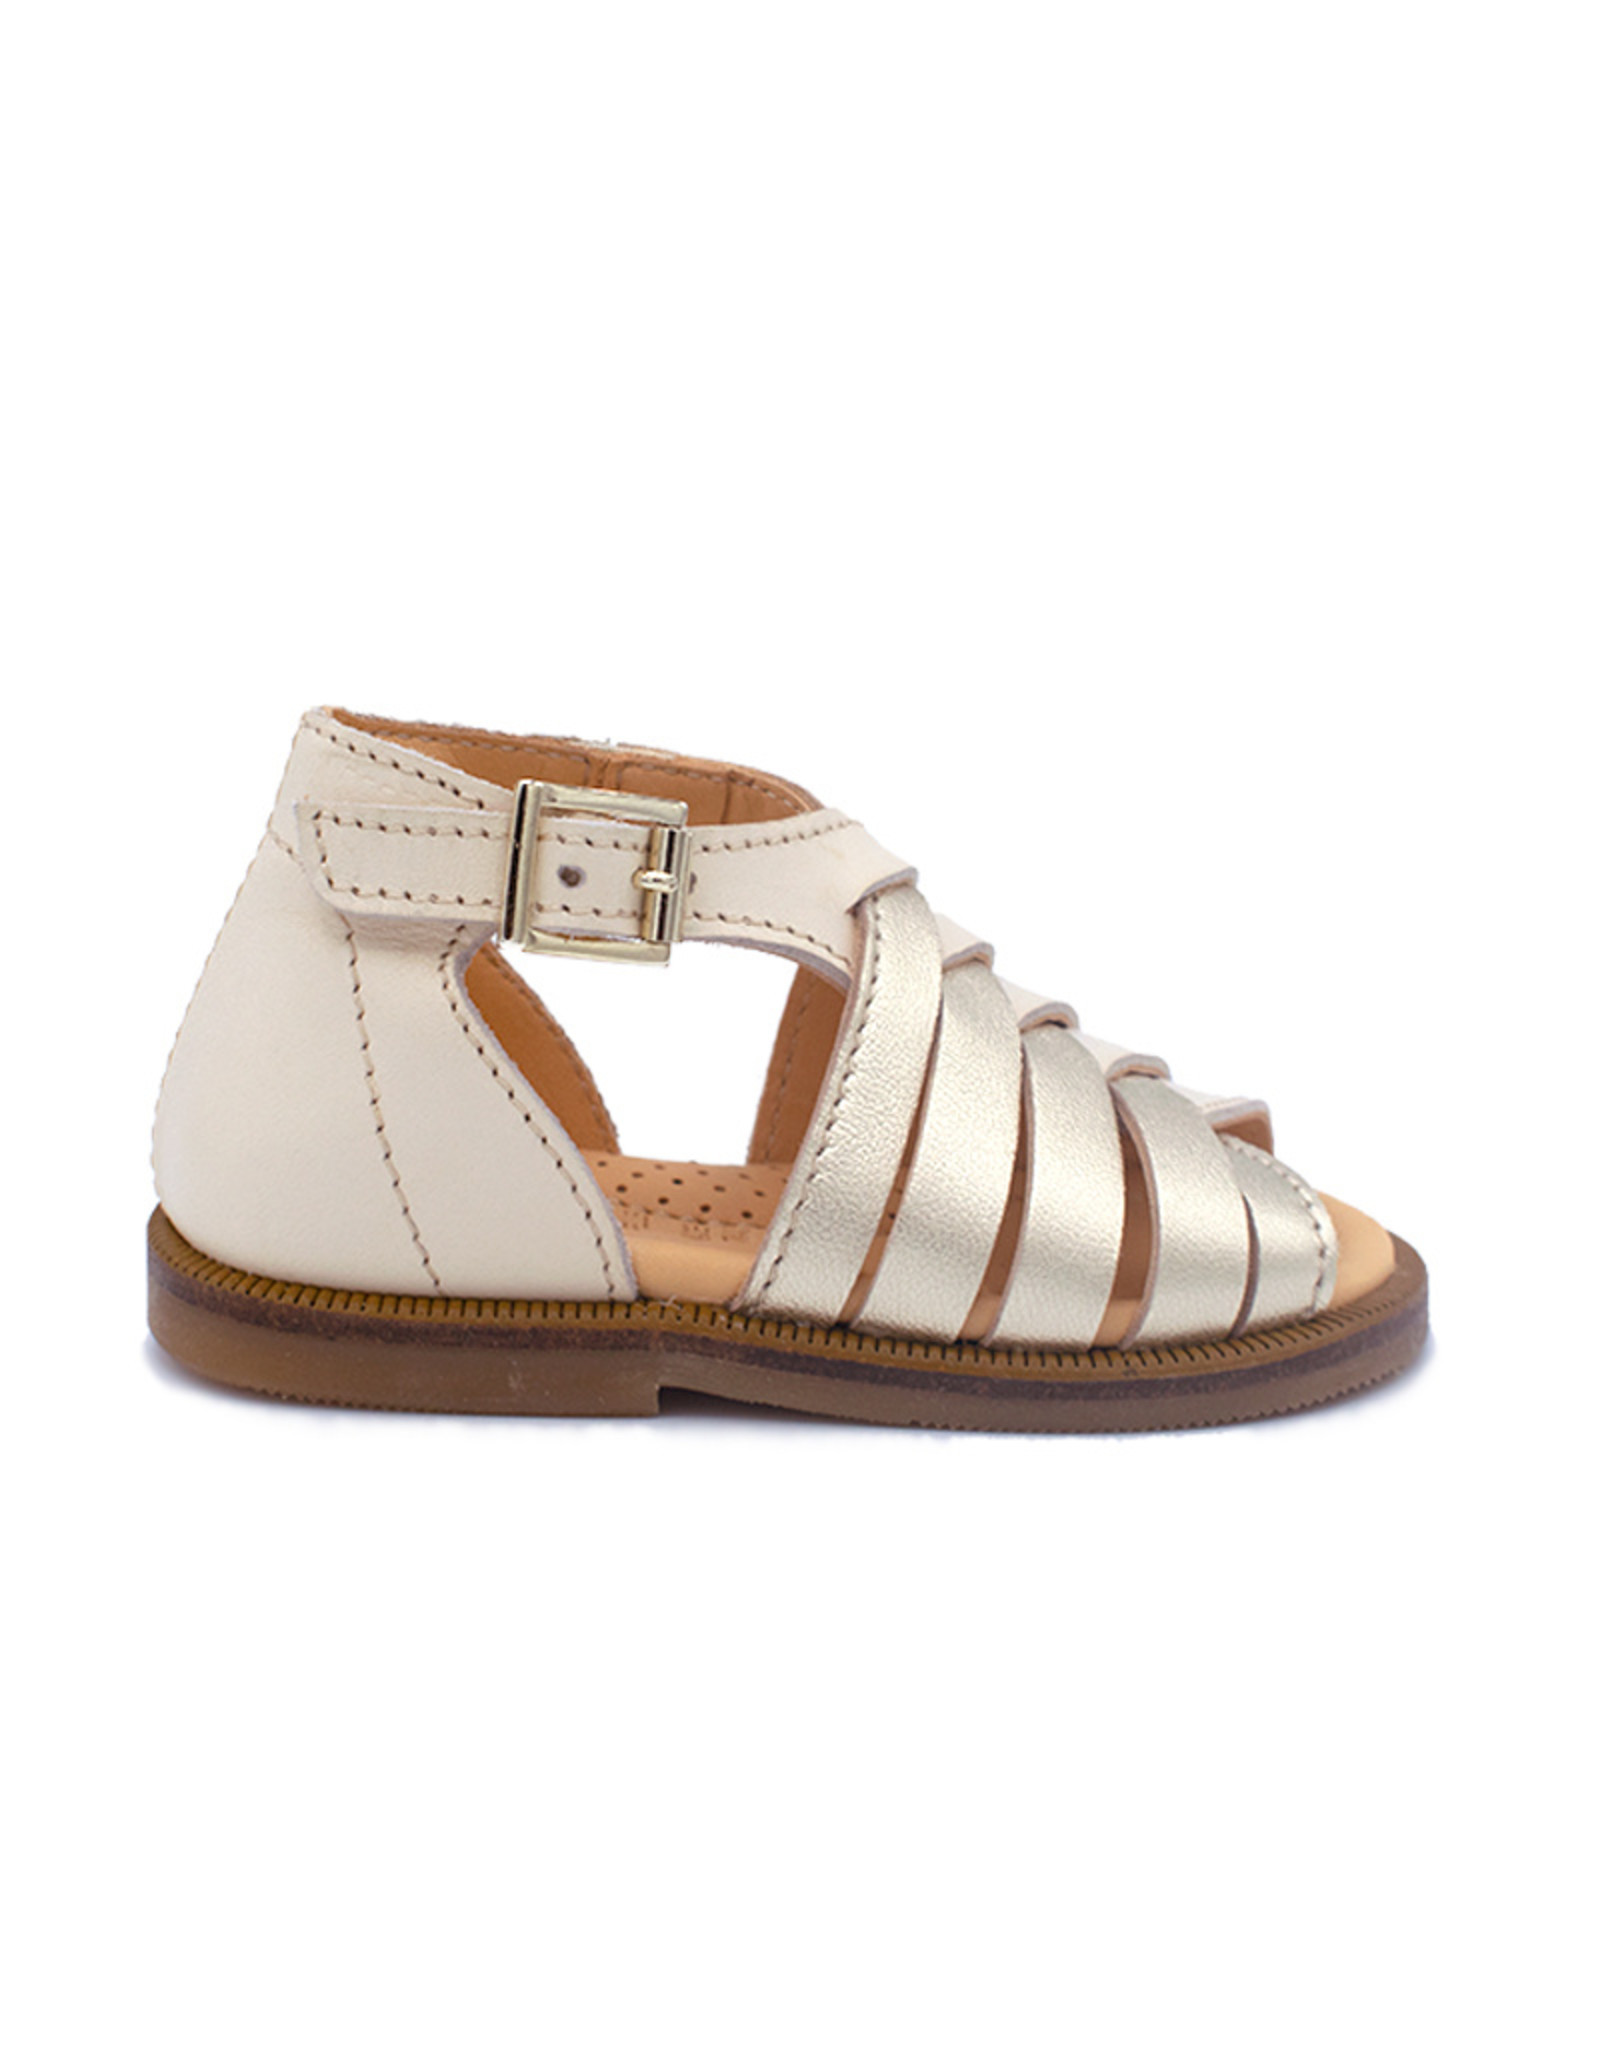 OCRA OCRA sandaal zliver wit